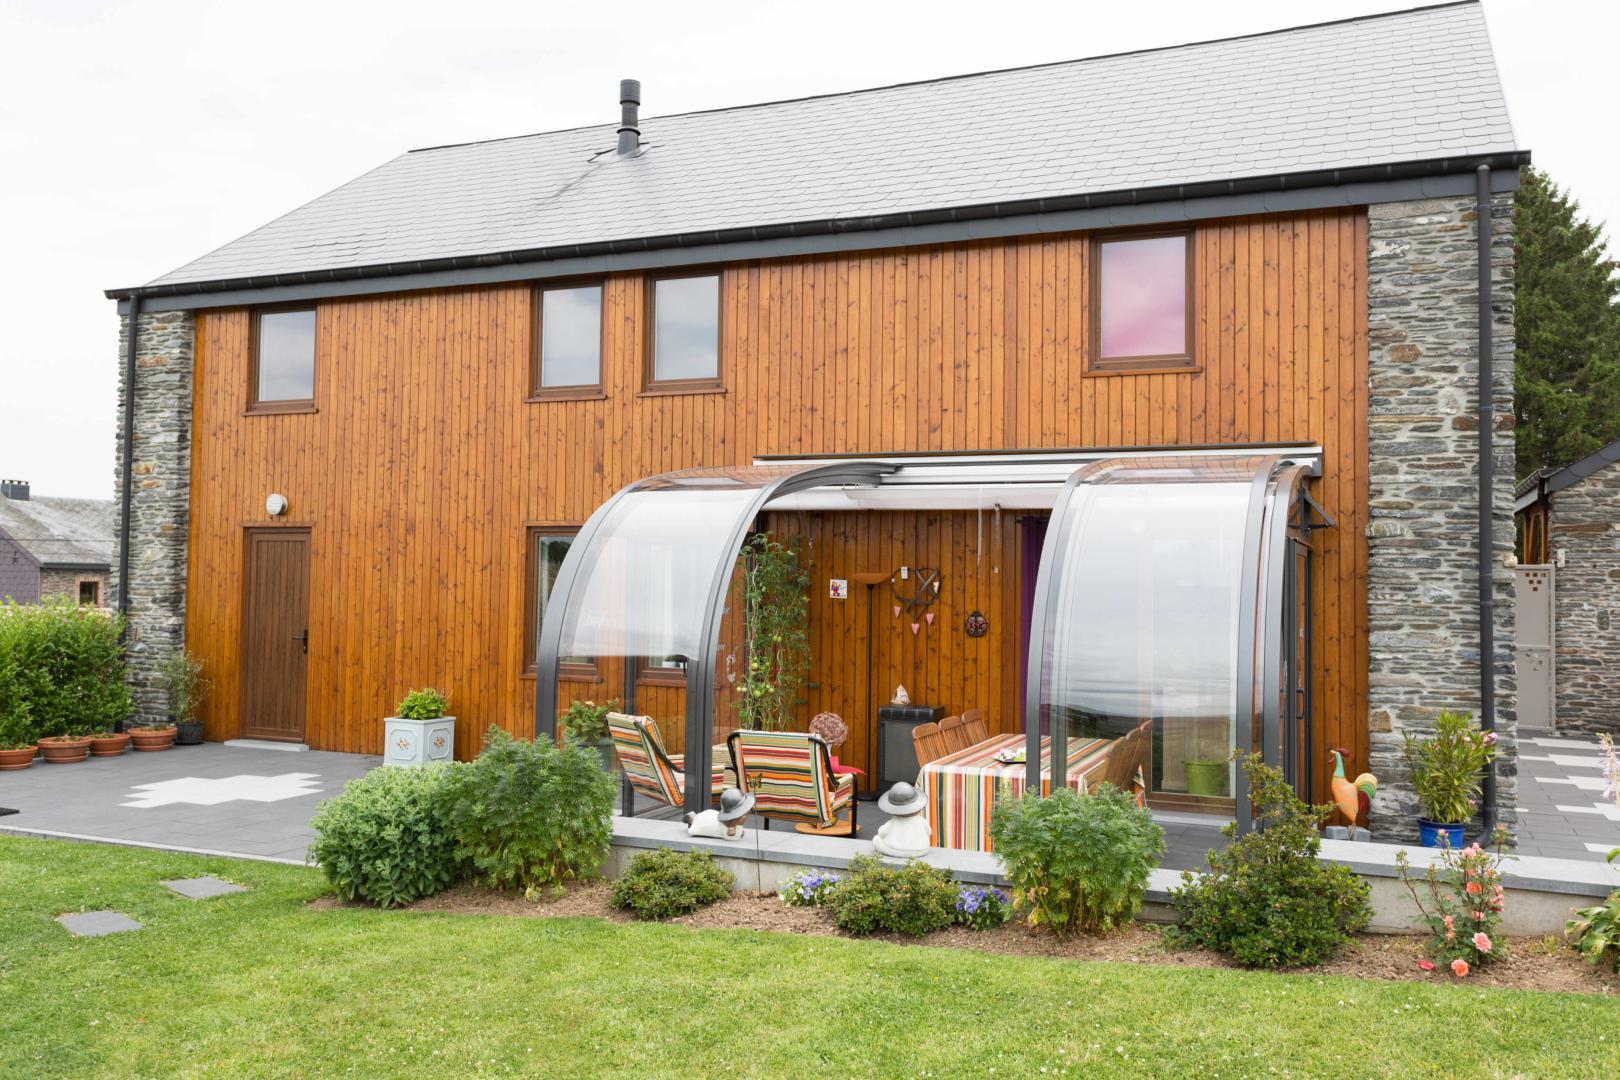 Abri de terrasse mod le saphir au galbe arrondi la solar for Abri veranda